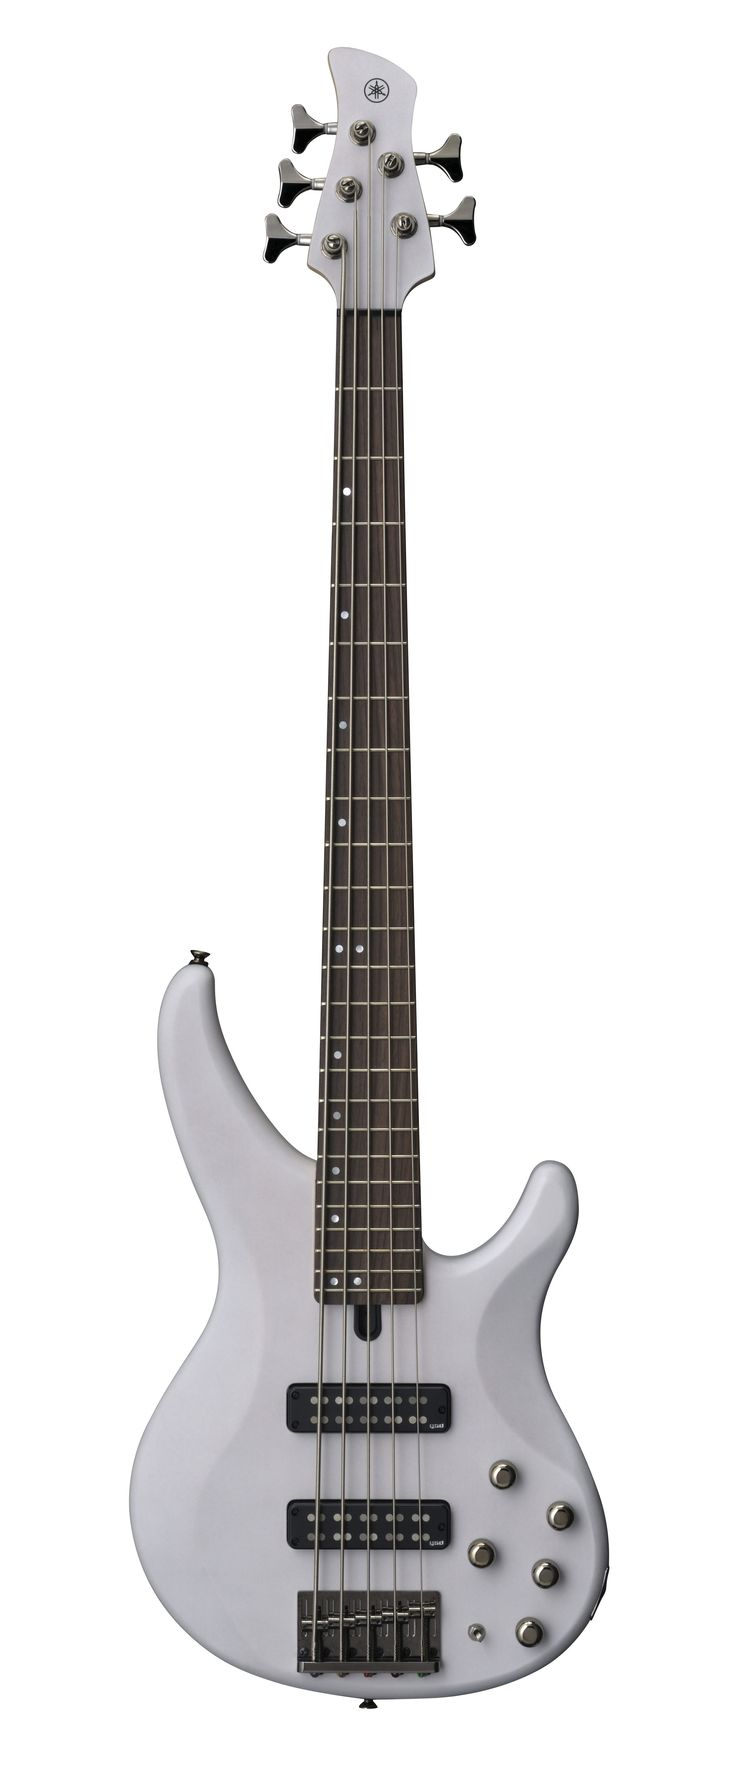 Yamaha bass guitar!!